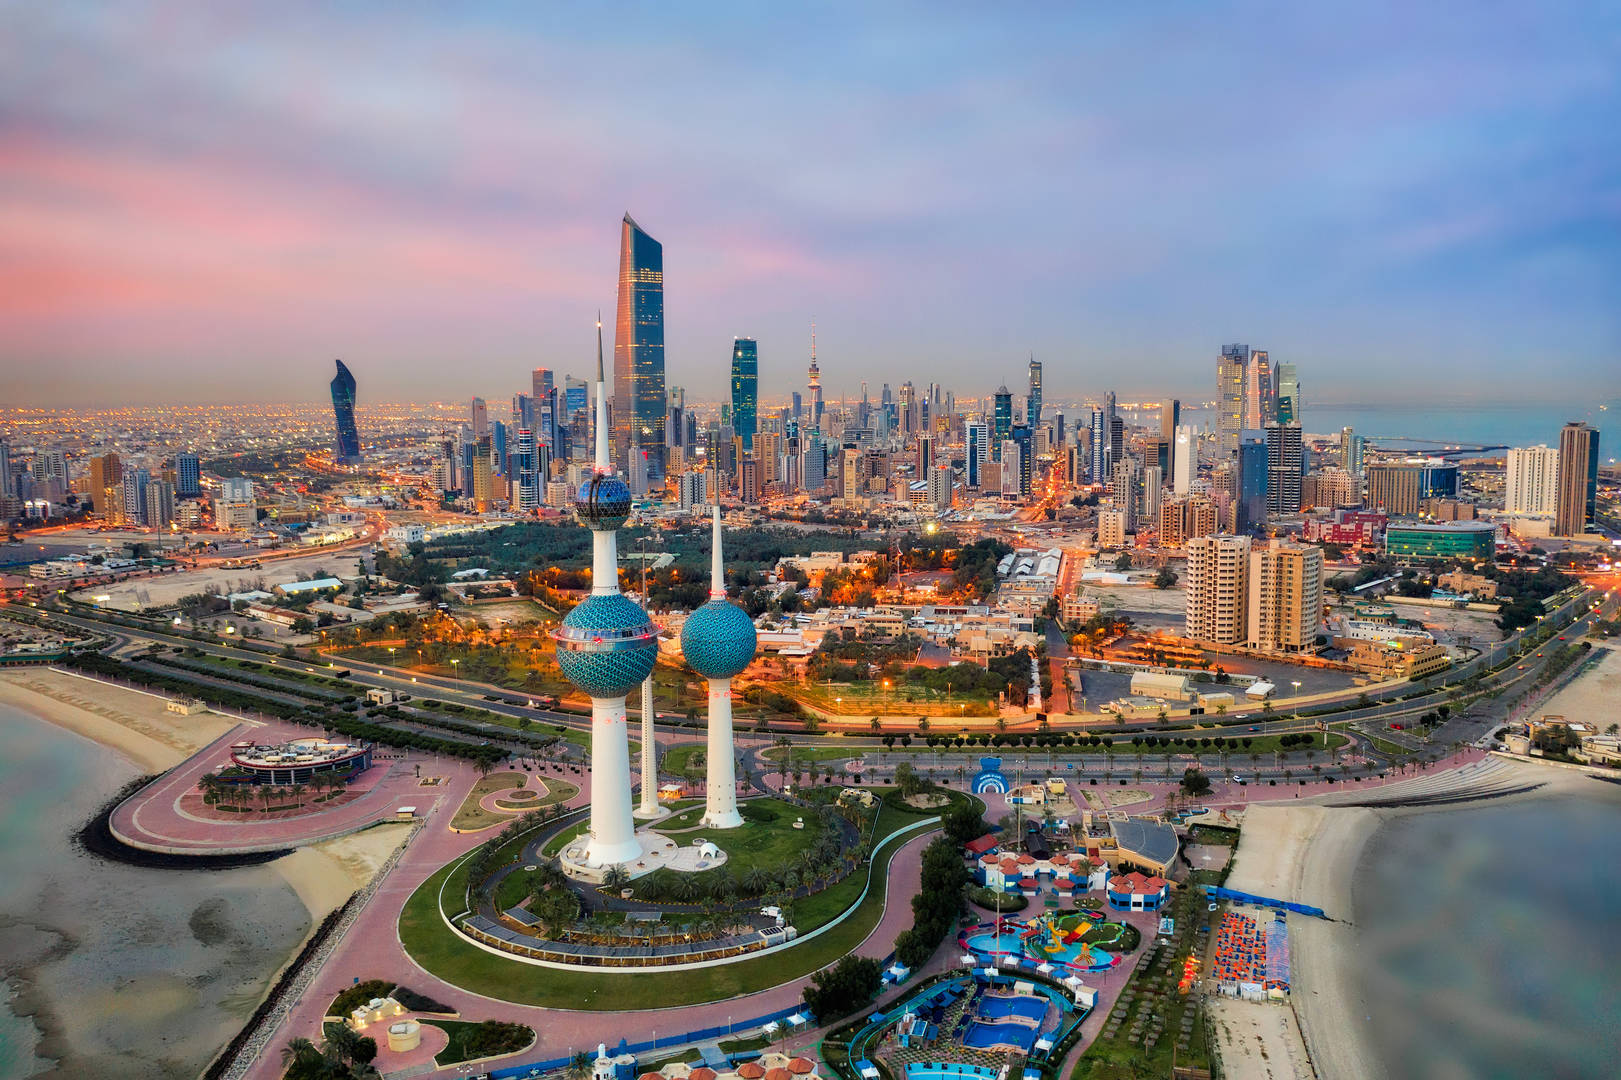 Kuwait's sparkling skyline